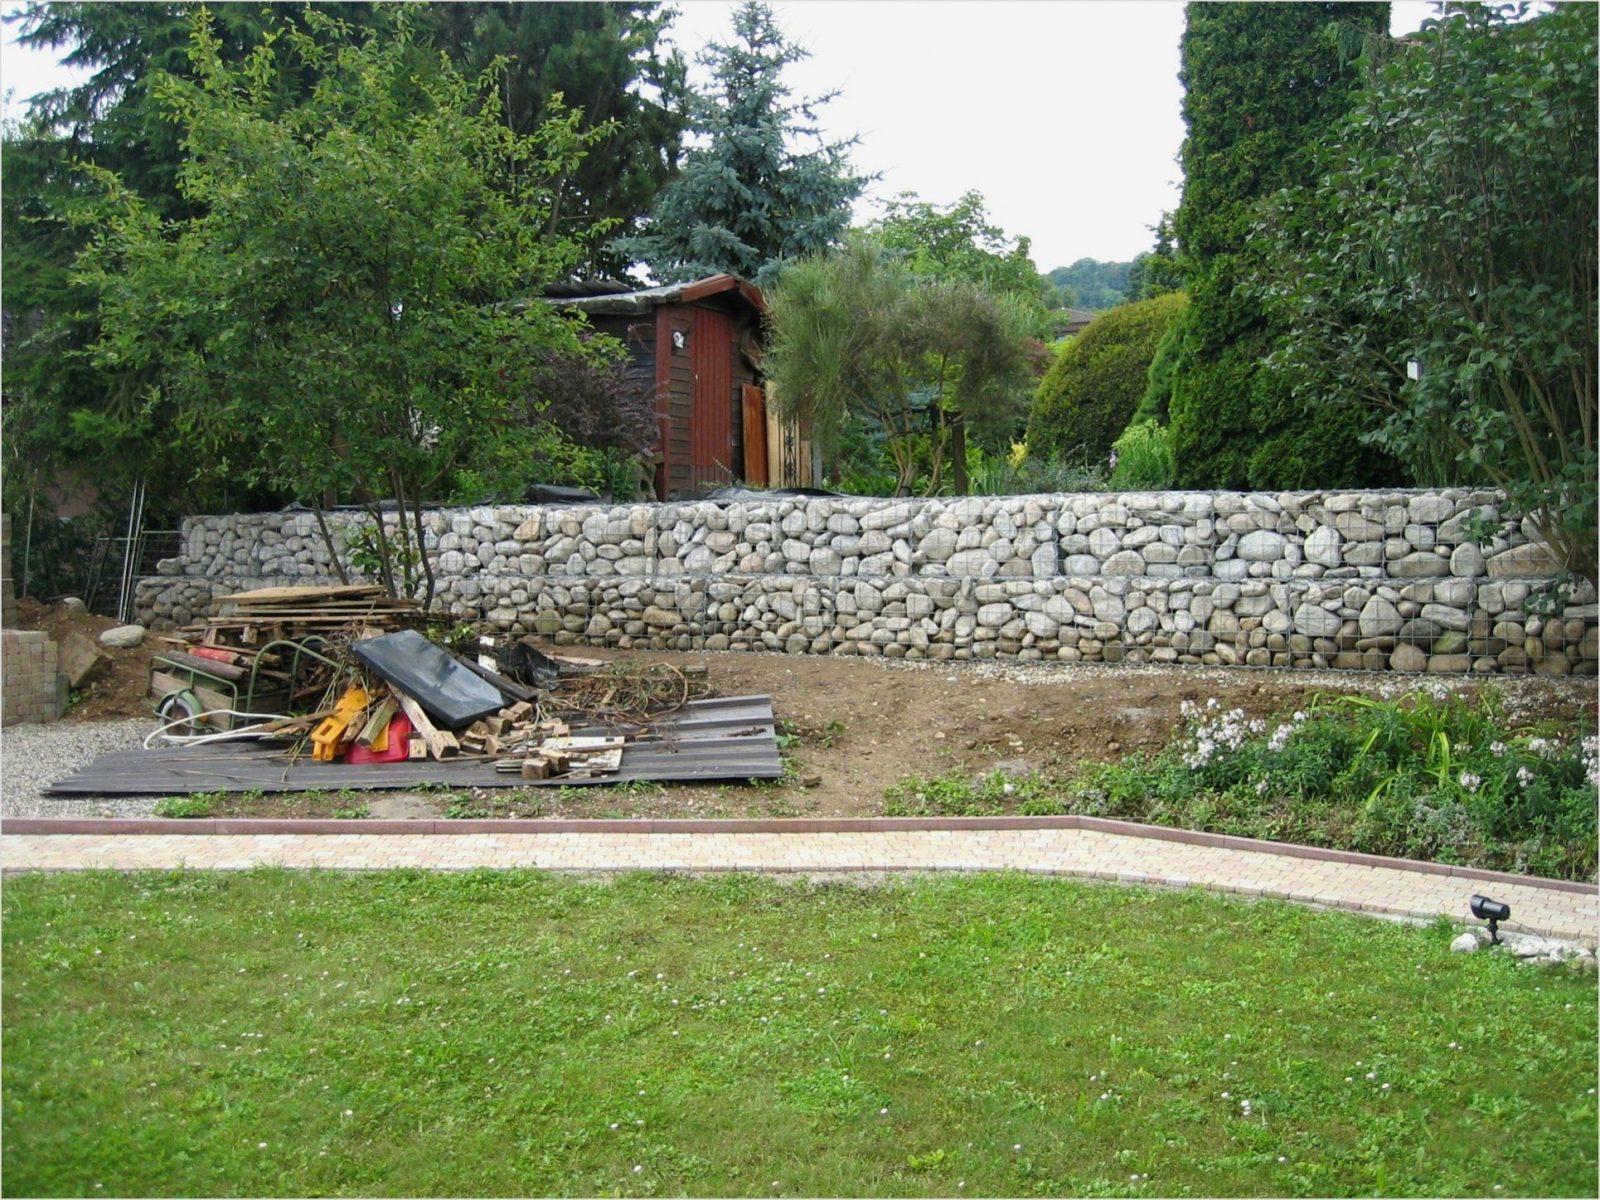 Outdoorküche Bauen Obi : Garten küche selber bauen obi einfach gartenküche ytong